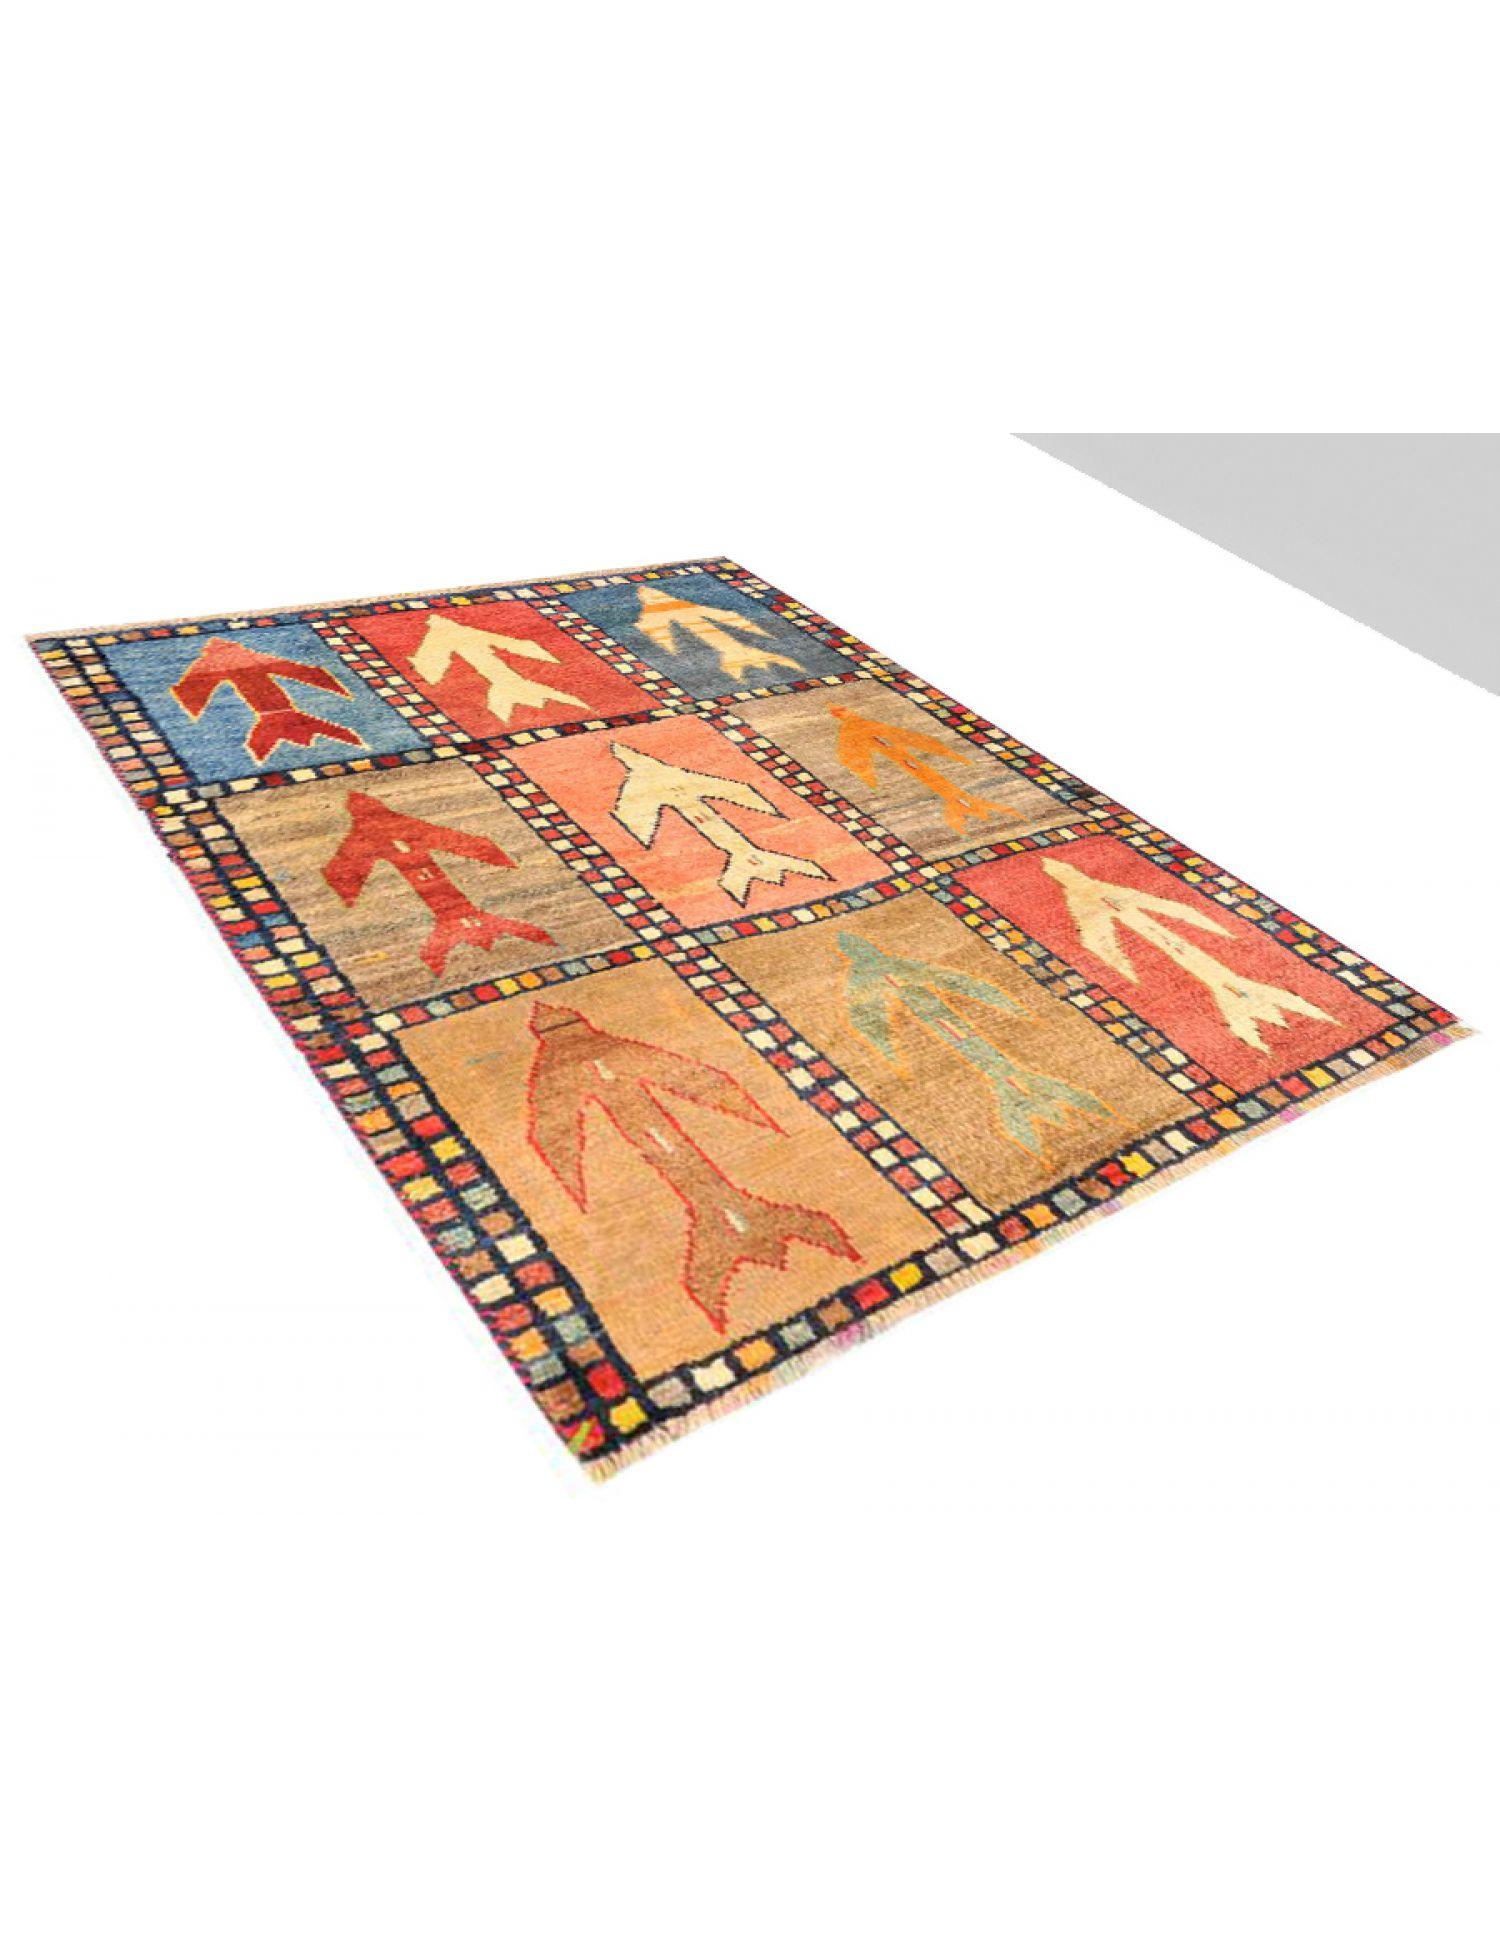 Moderne Teppiche  mehrfarbig <br/>130 x 94 cm